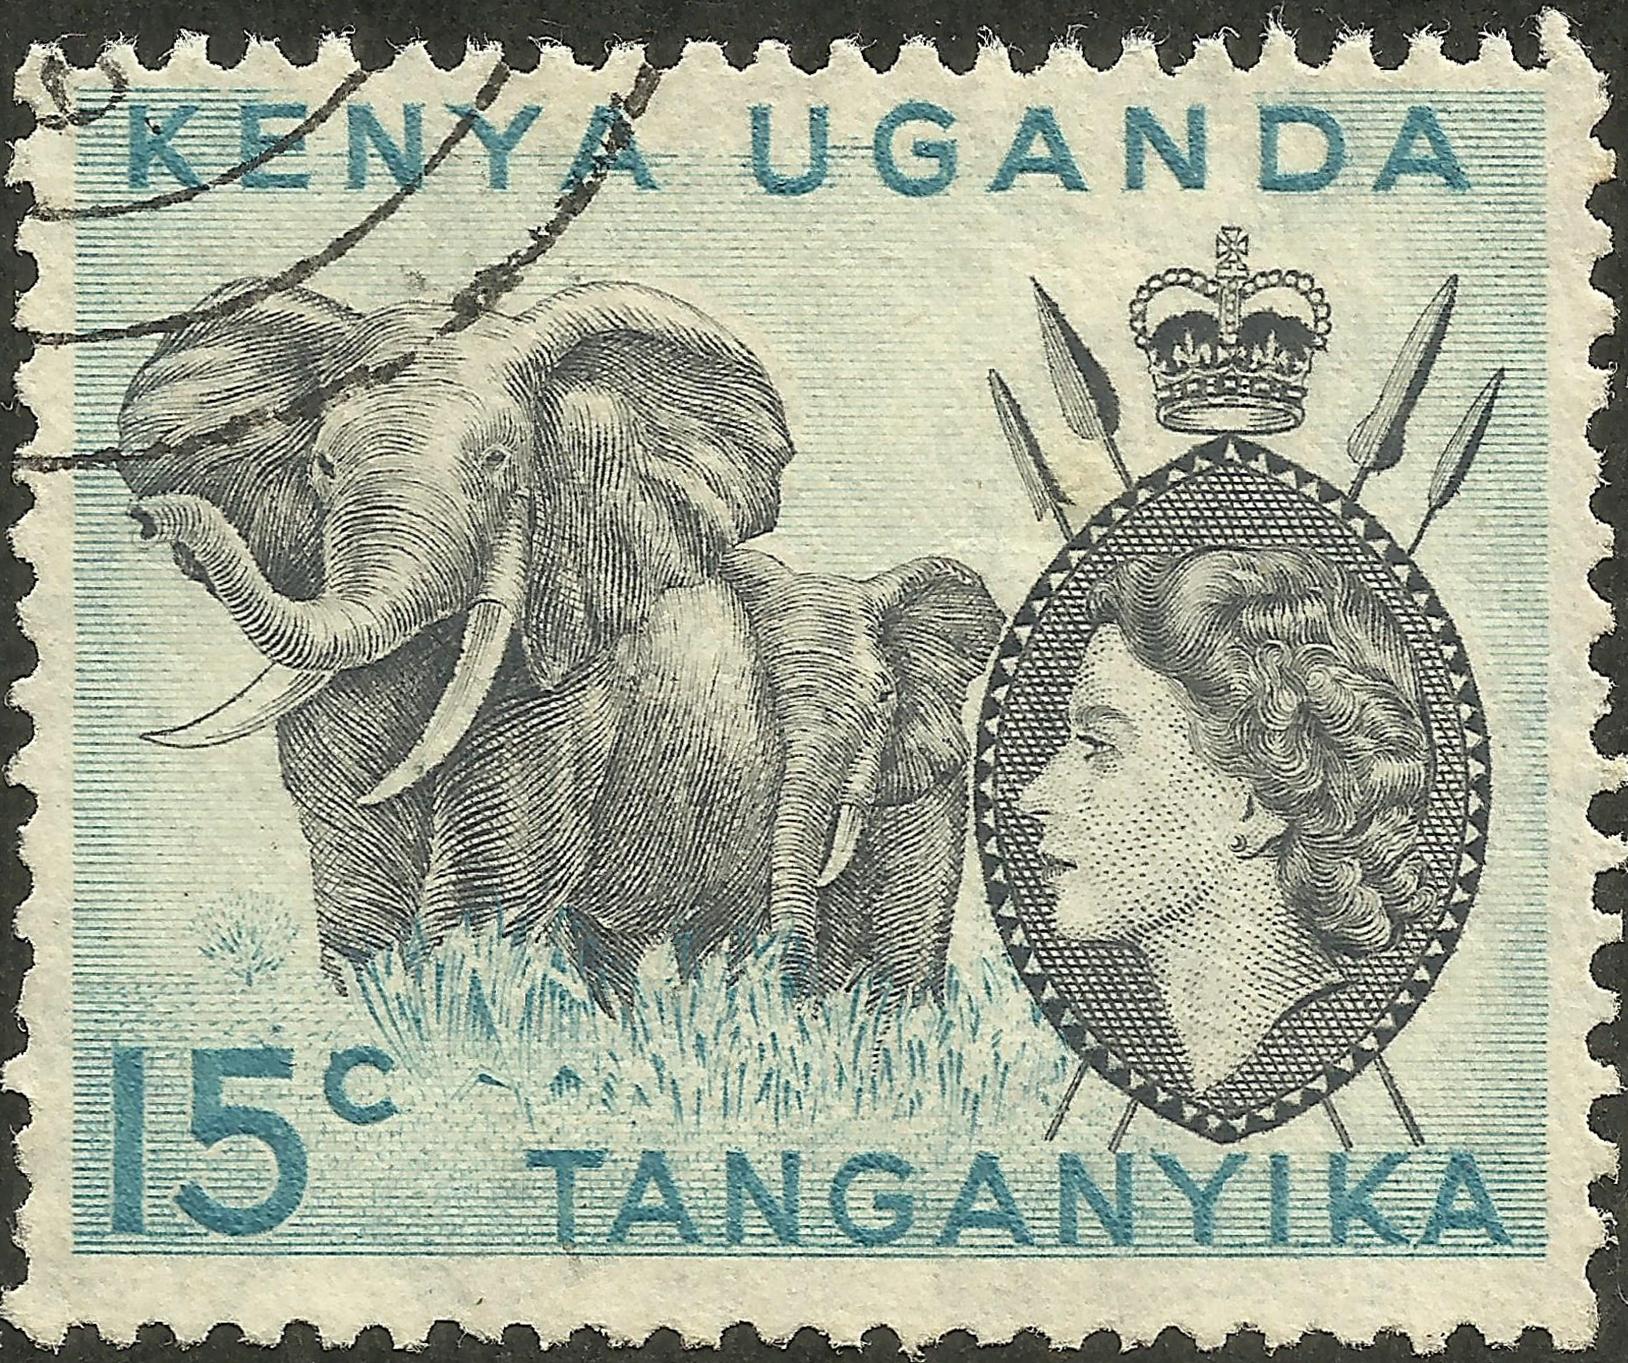 Kenya, Uganda, Tanganyika #105 (1958)